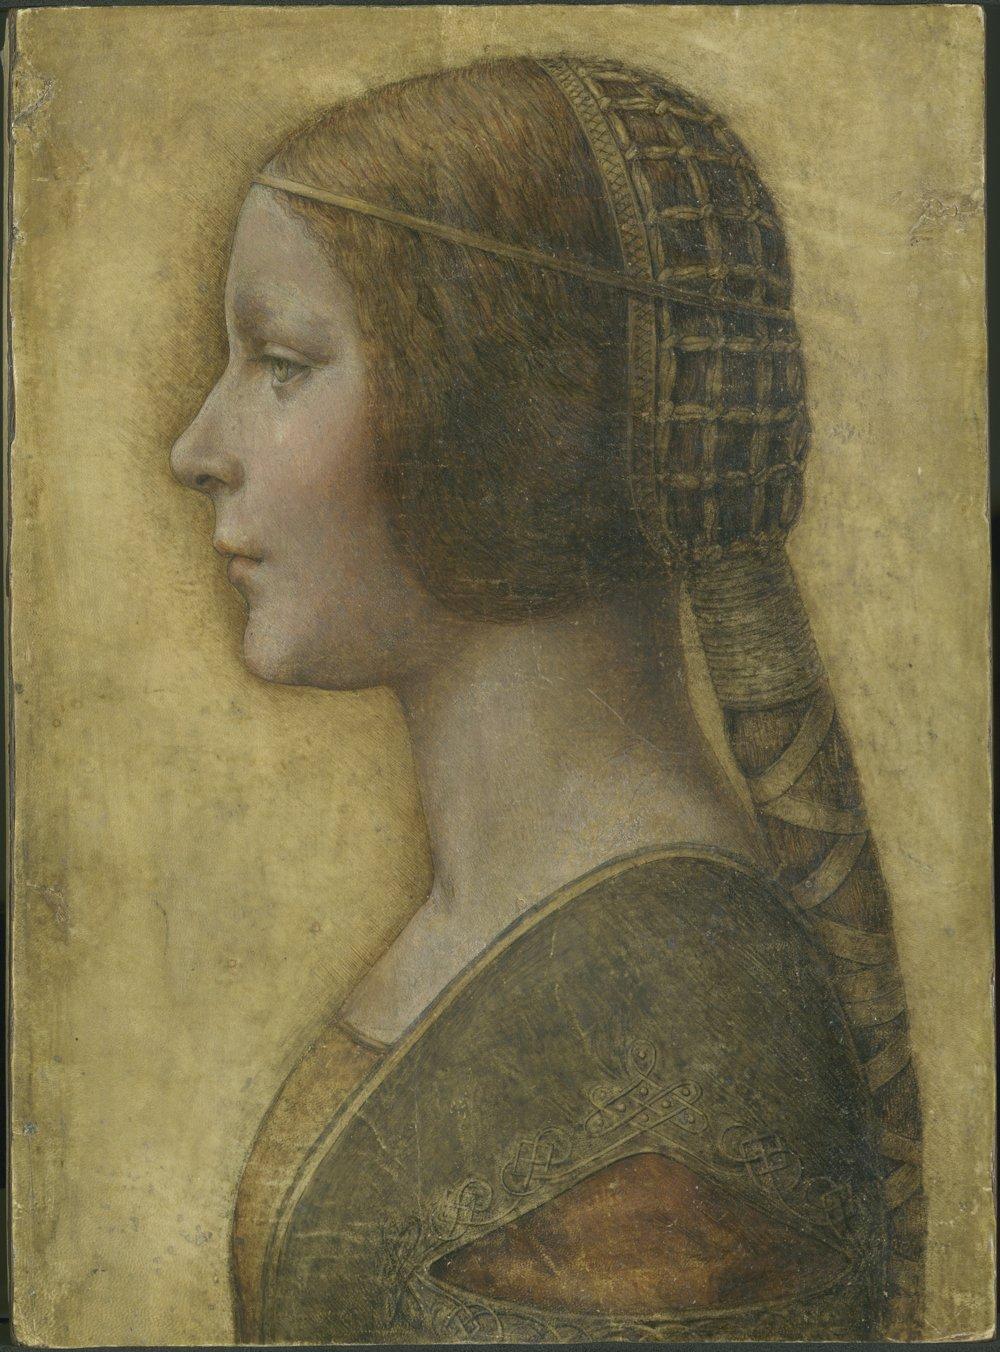 Leonardo Da Vinci - Bella Principessa - Large - Archival Matte - Brown Frame Vintage Wall Art Poster Picture Giclee Artwork Modern Contemporary & Fine Art Print